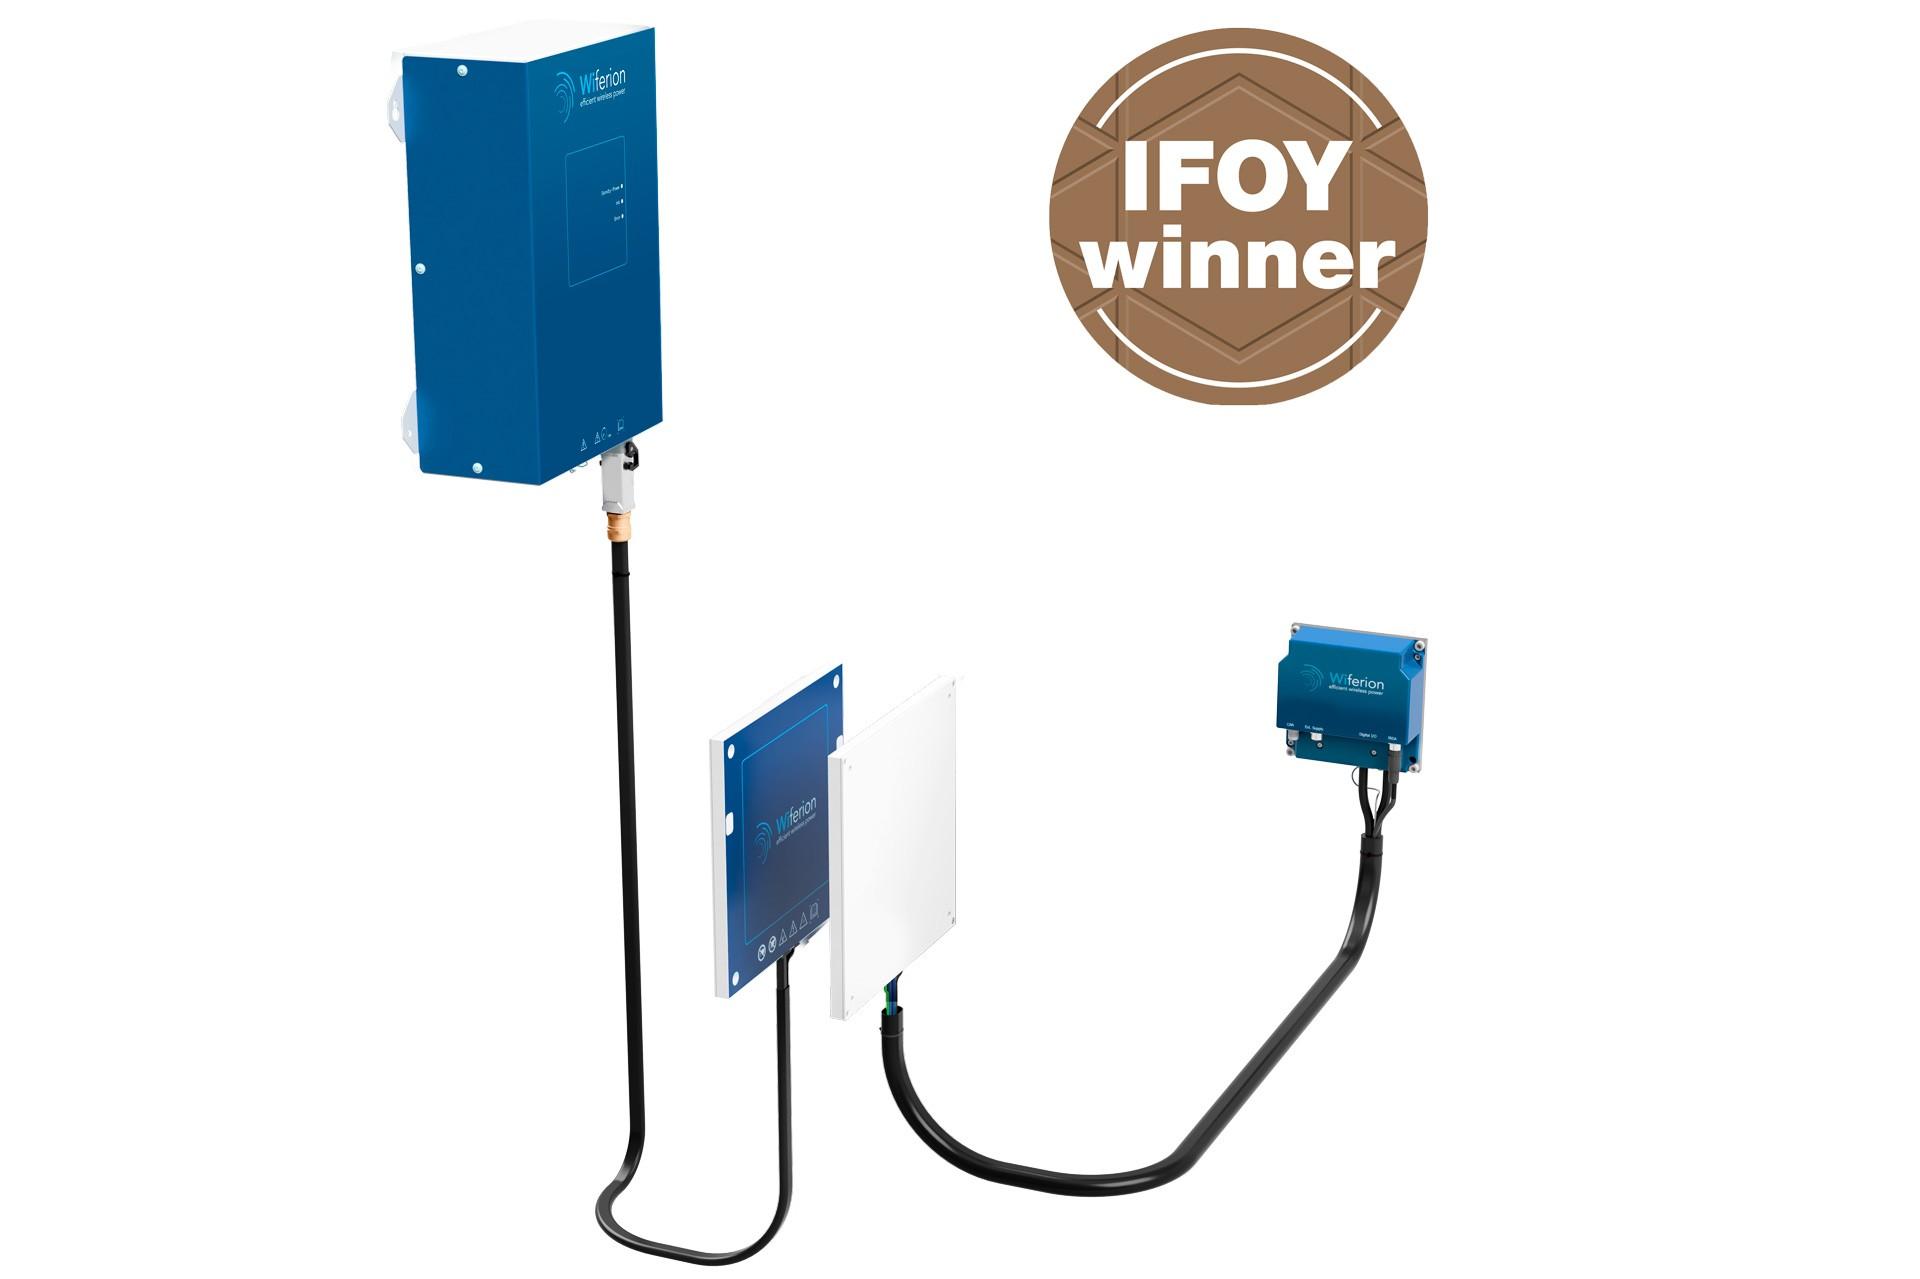 etaLINK 3000 - new Mobile Unit 2020 - wireless power - wireless charging - 3kW - induktives laden agv